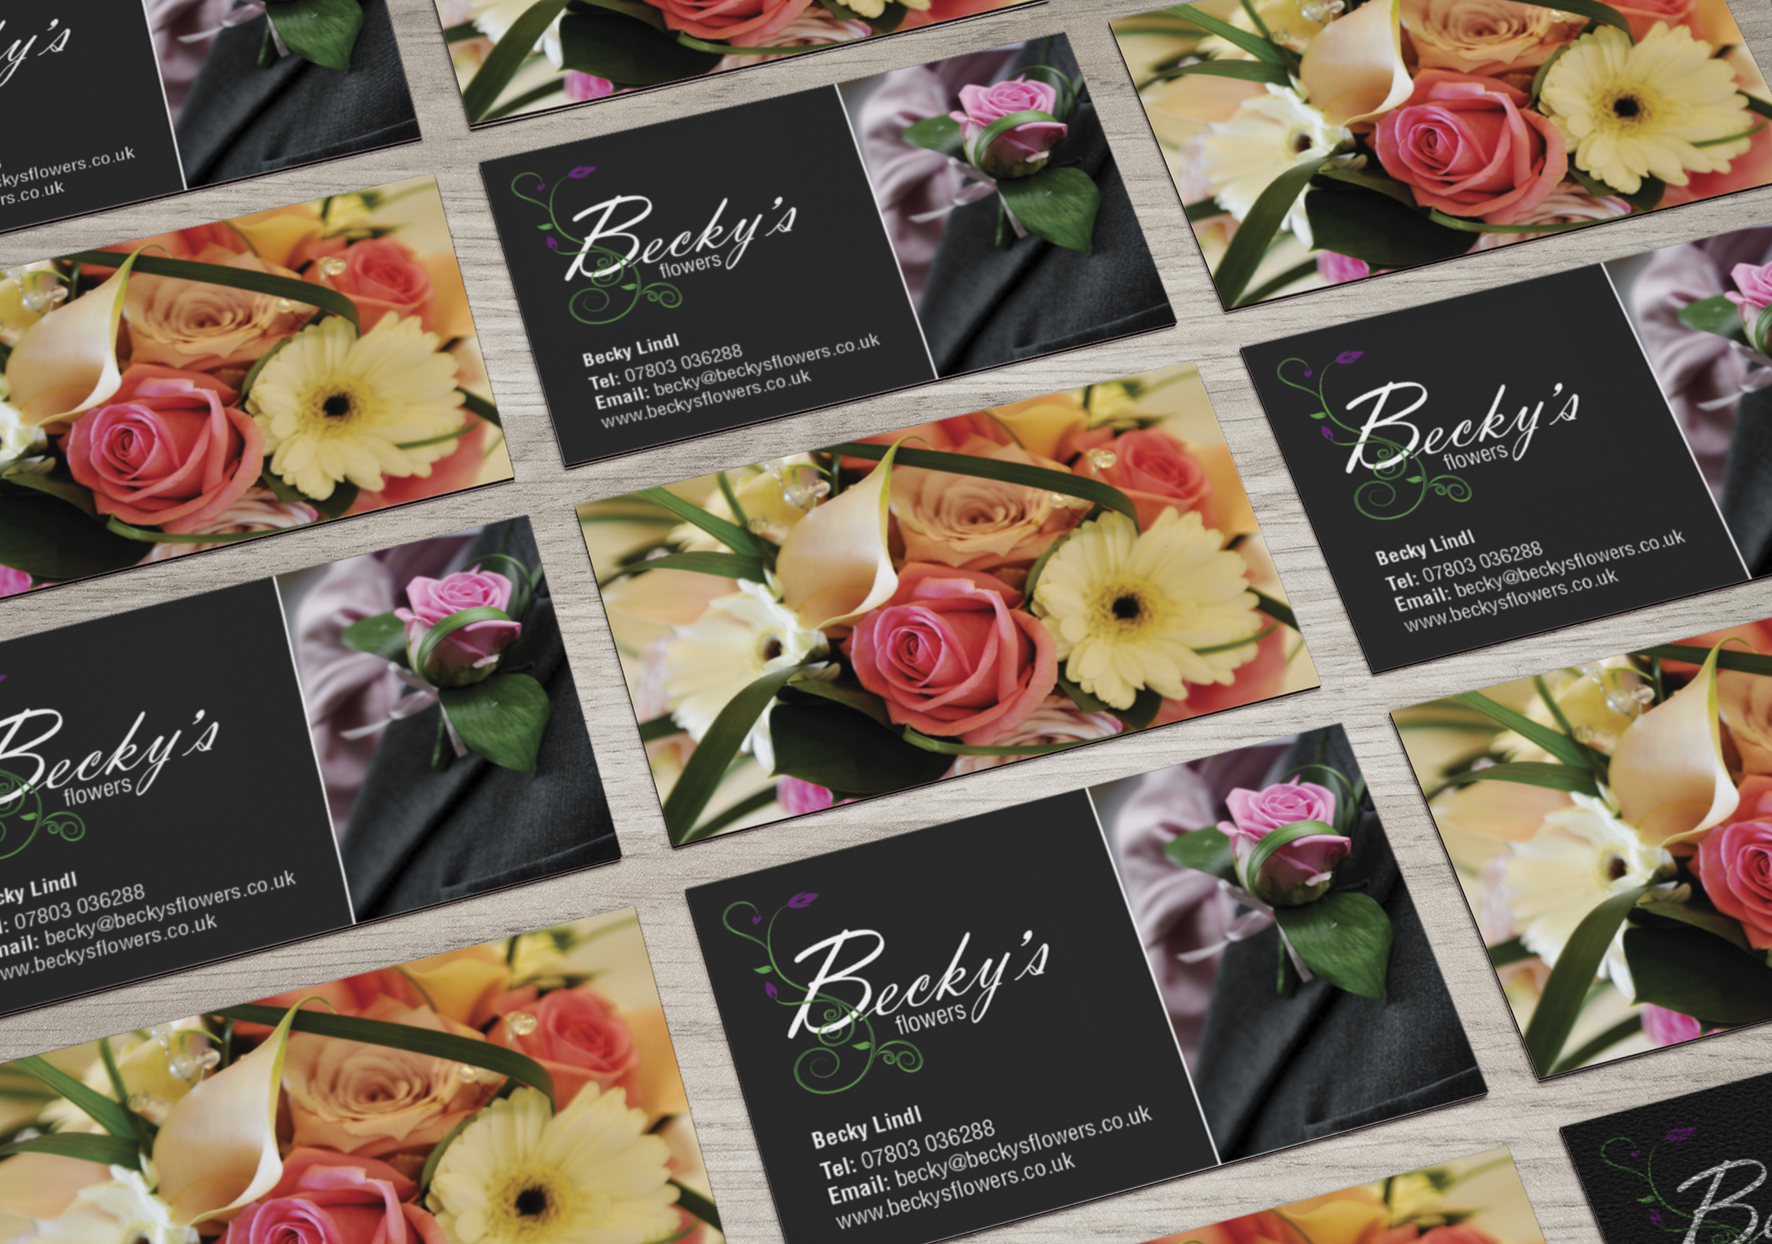 Beckys Flowers BC.jpg